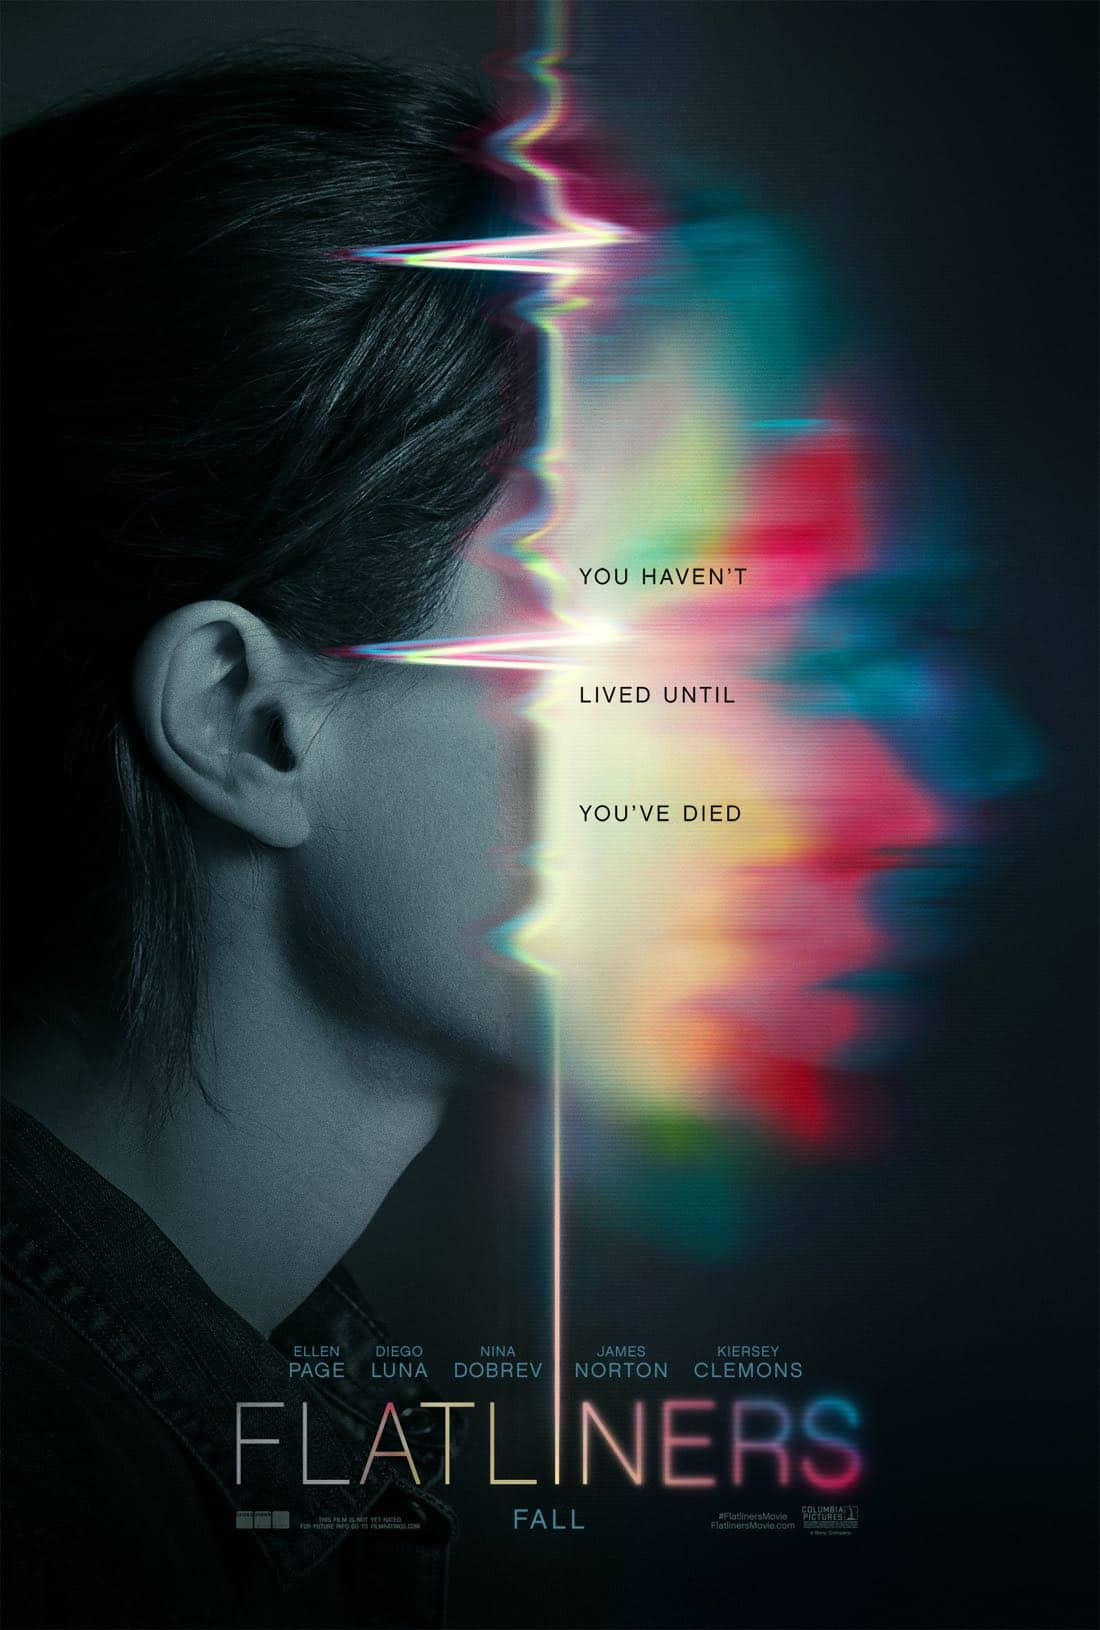 Flatliners-Movie-Poster-2017